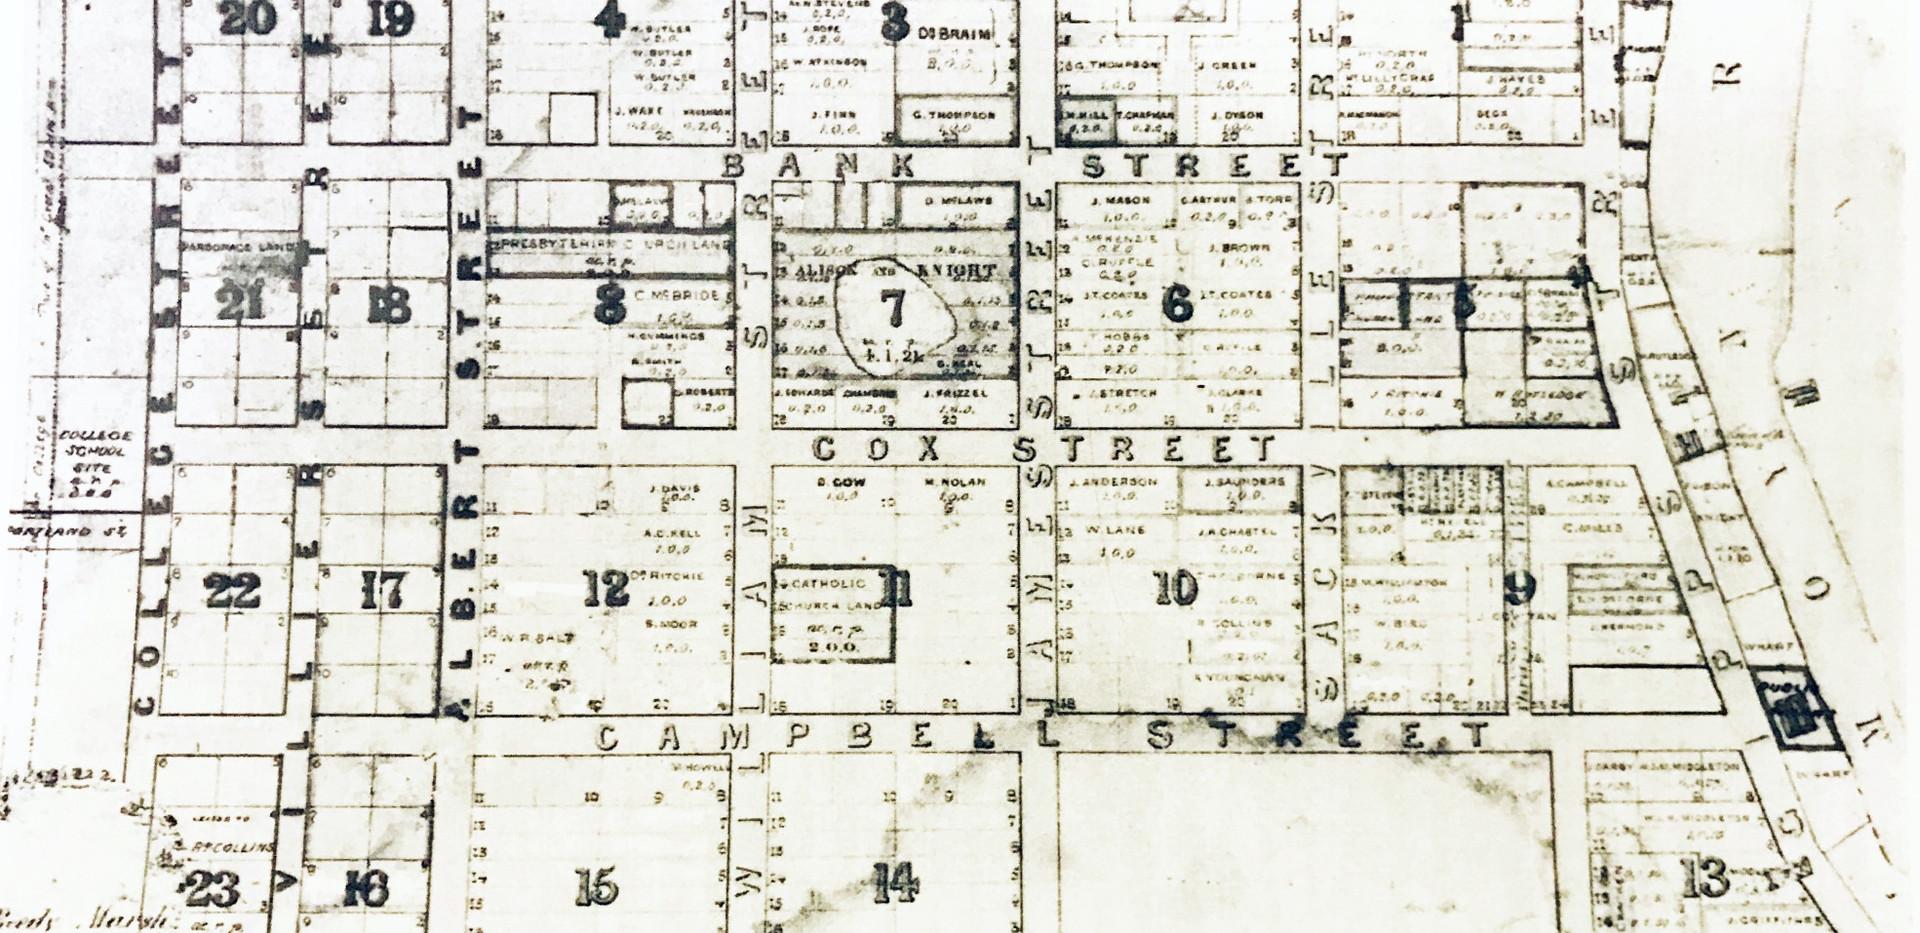 OMI_Map of Belfast 1850.jpg